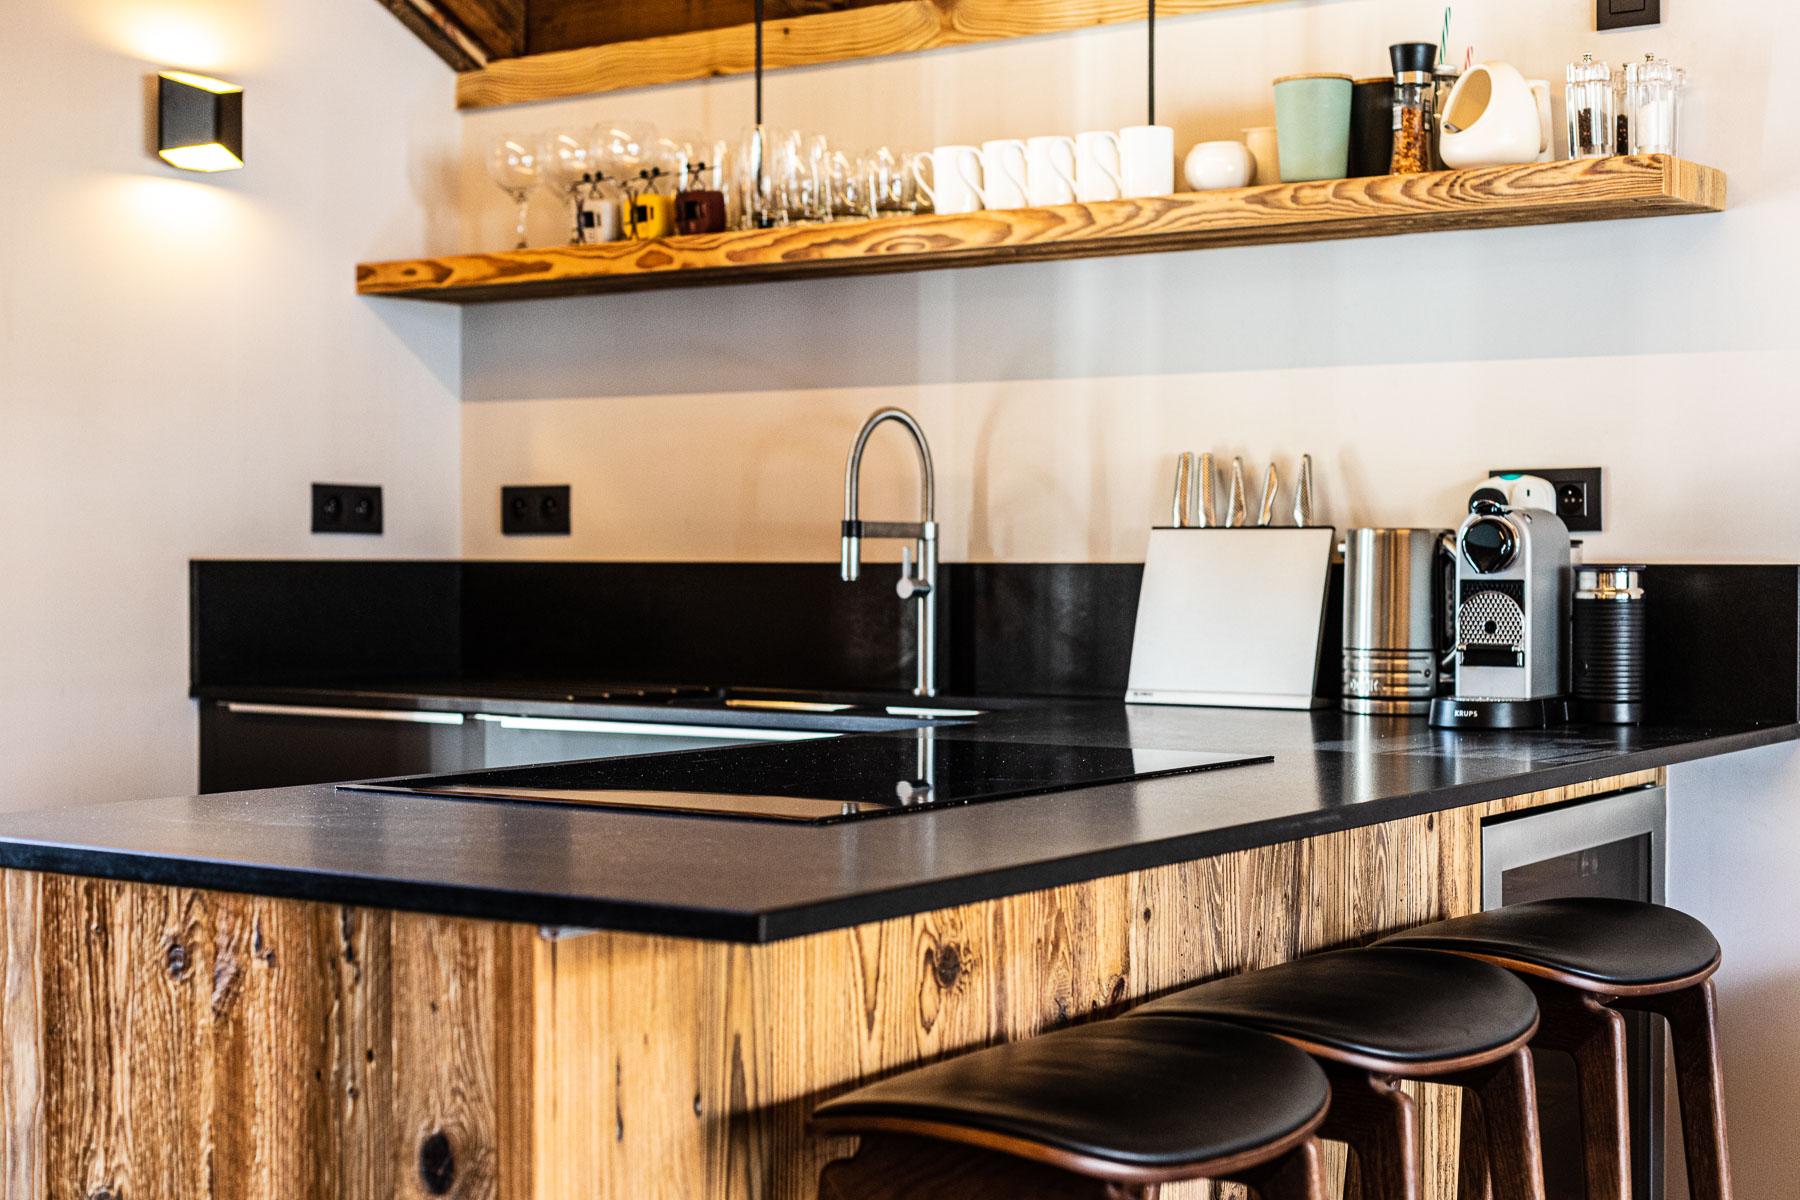 KTerra Kitchen area